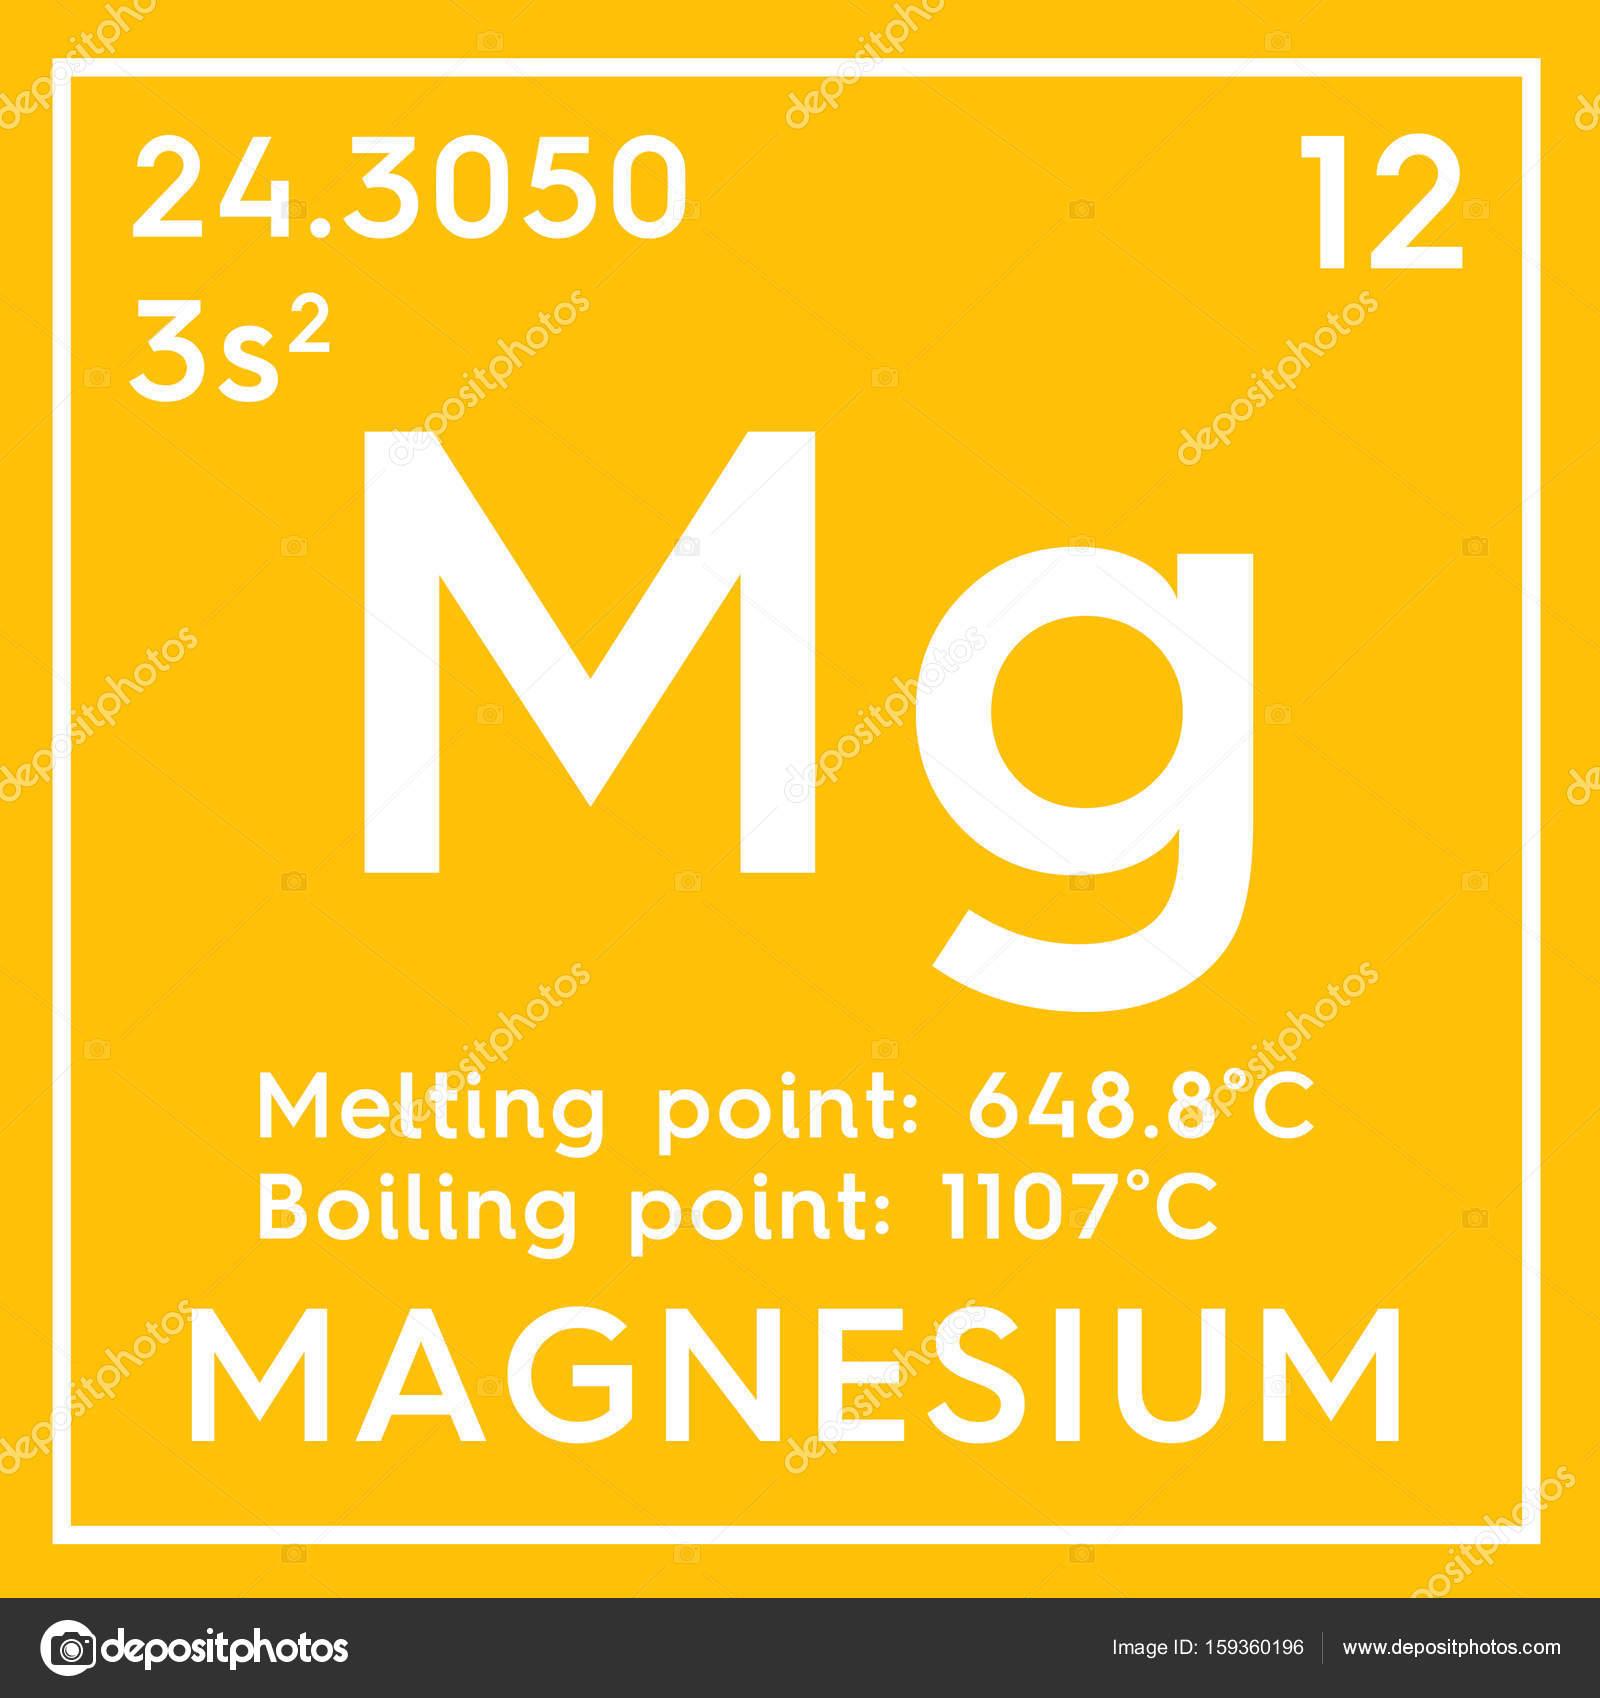 Magnesium alkaline earth metals chemical element of mendeleevs alkaline earth metals chemical element of mendeleevs periodic table stock photo urtaz Gallery